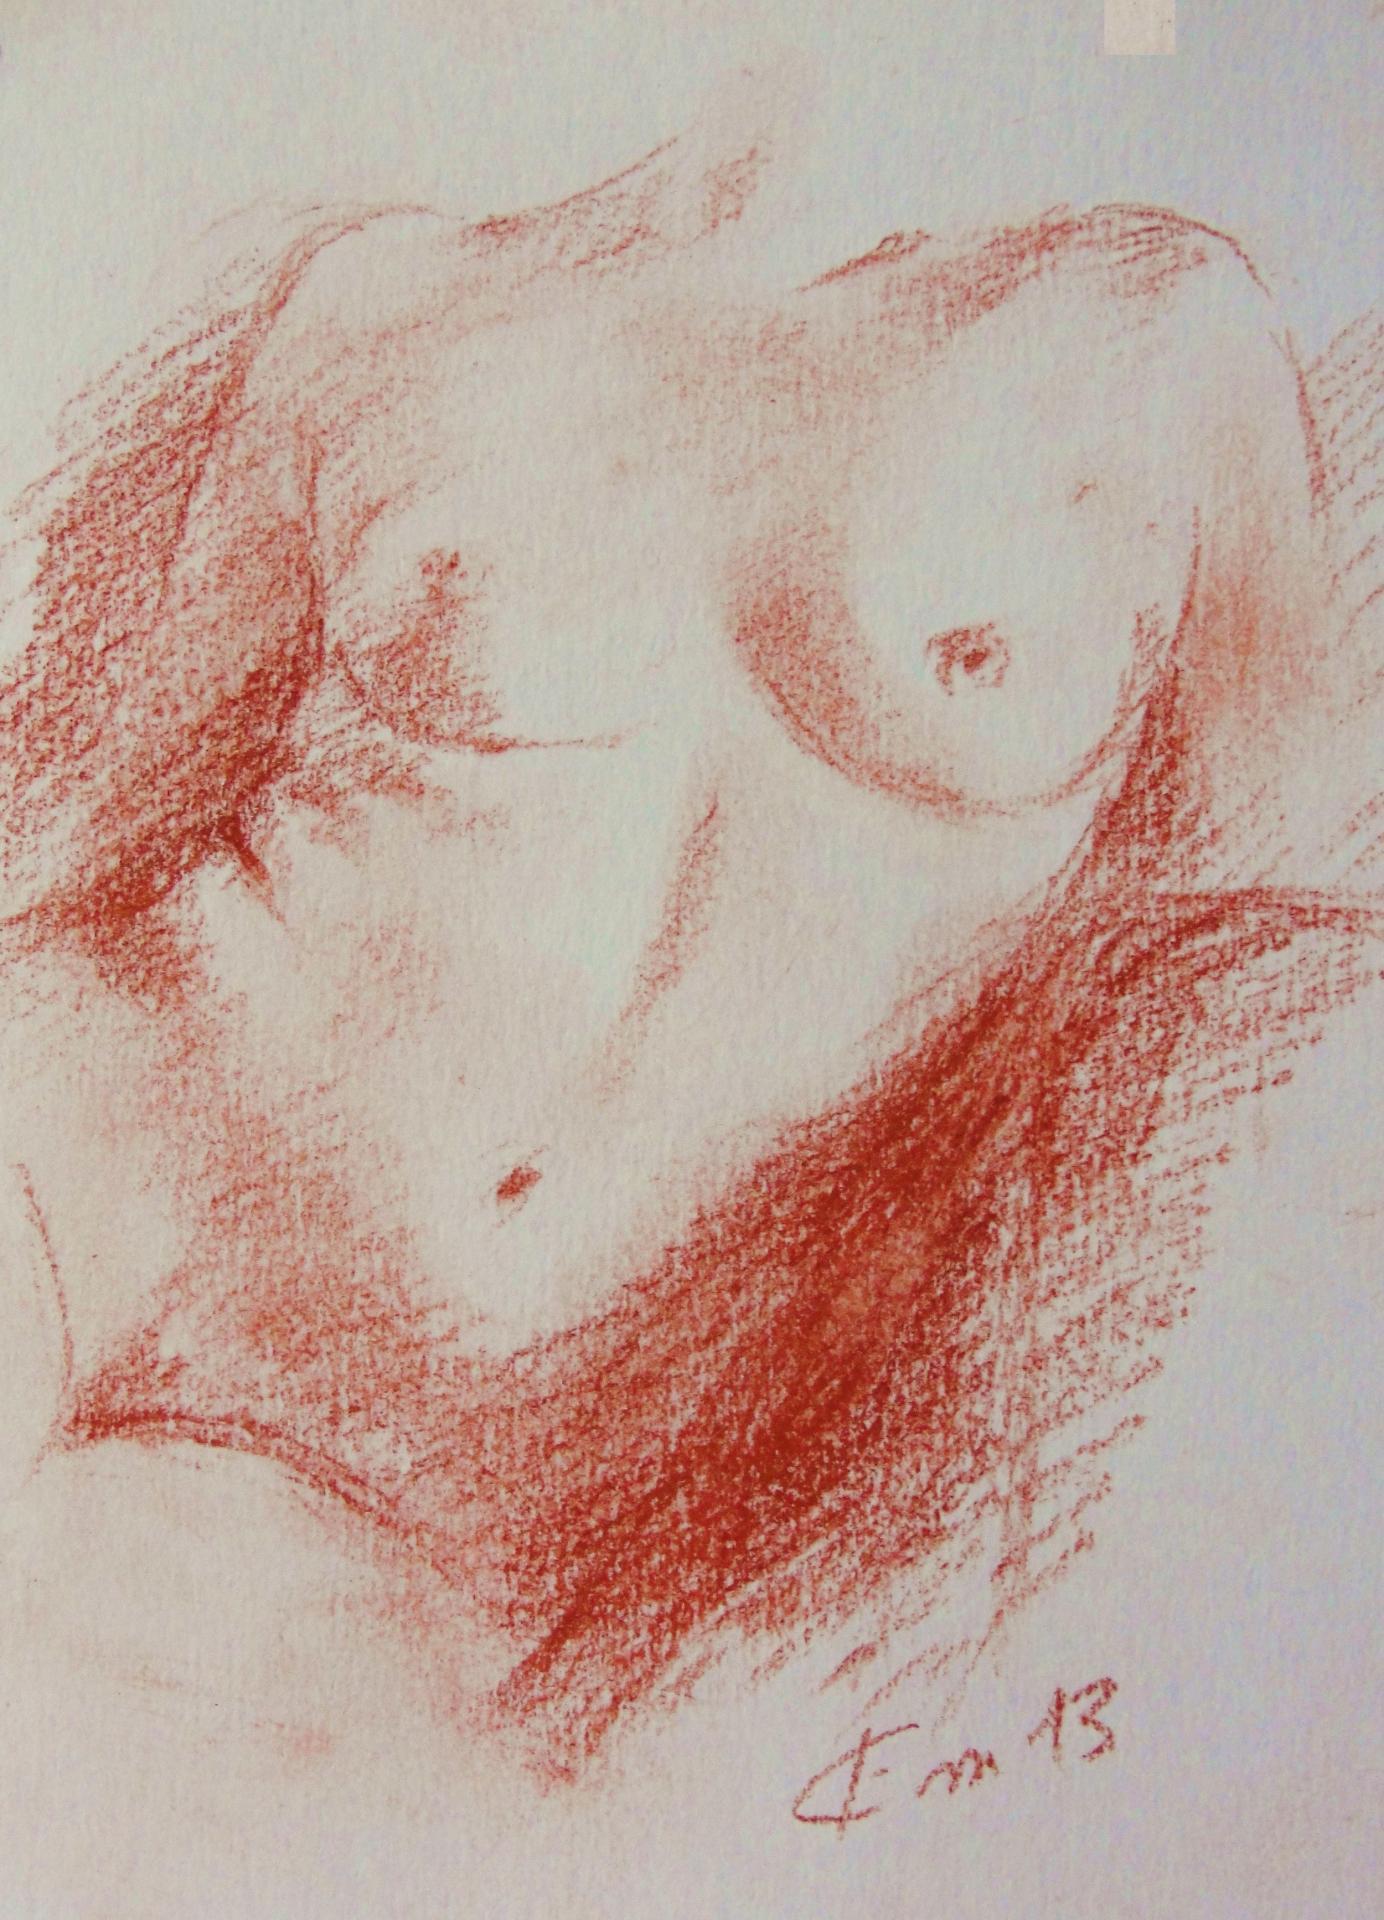 Nu artistique sanguine de jean joseph chevalier 4